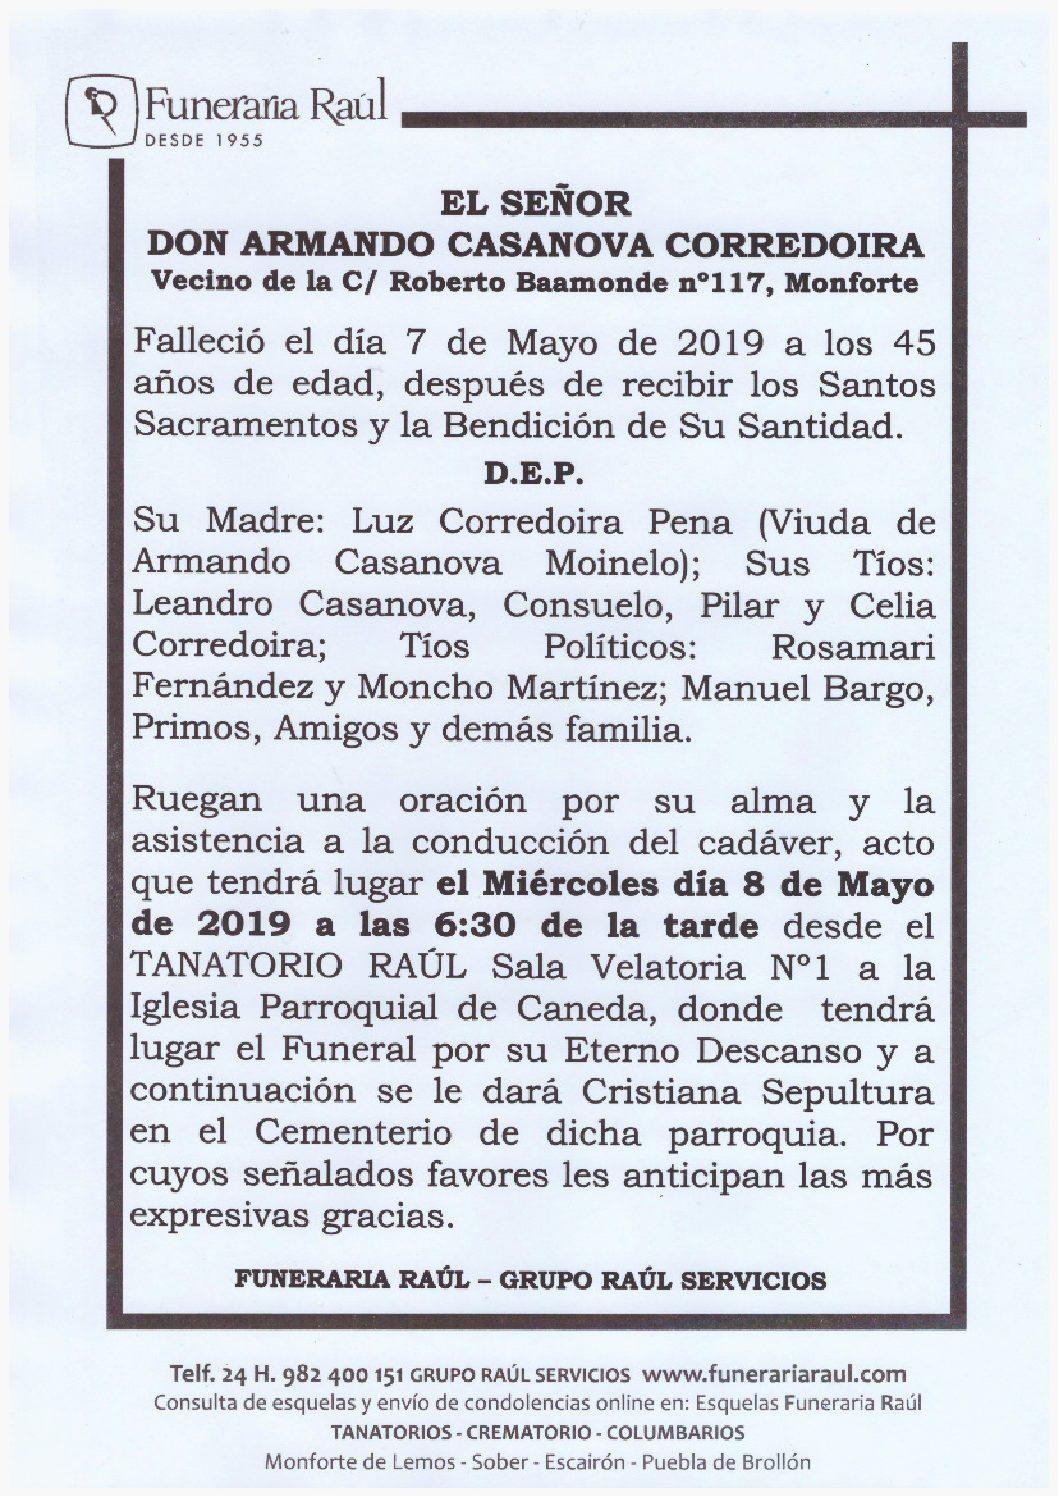 DON ARMANDO CASANOVA CORREDOIRA